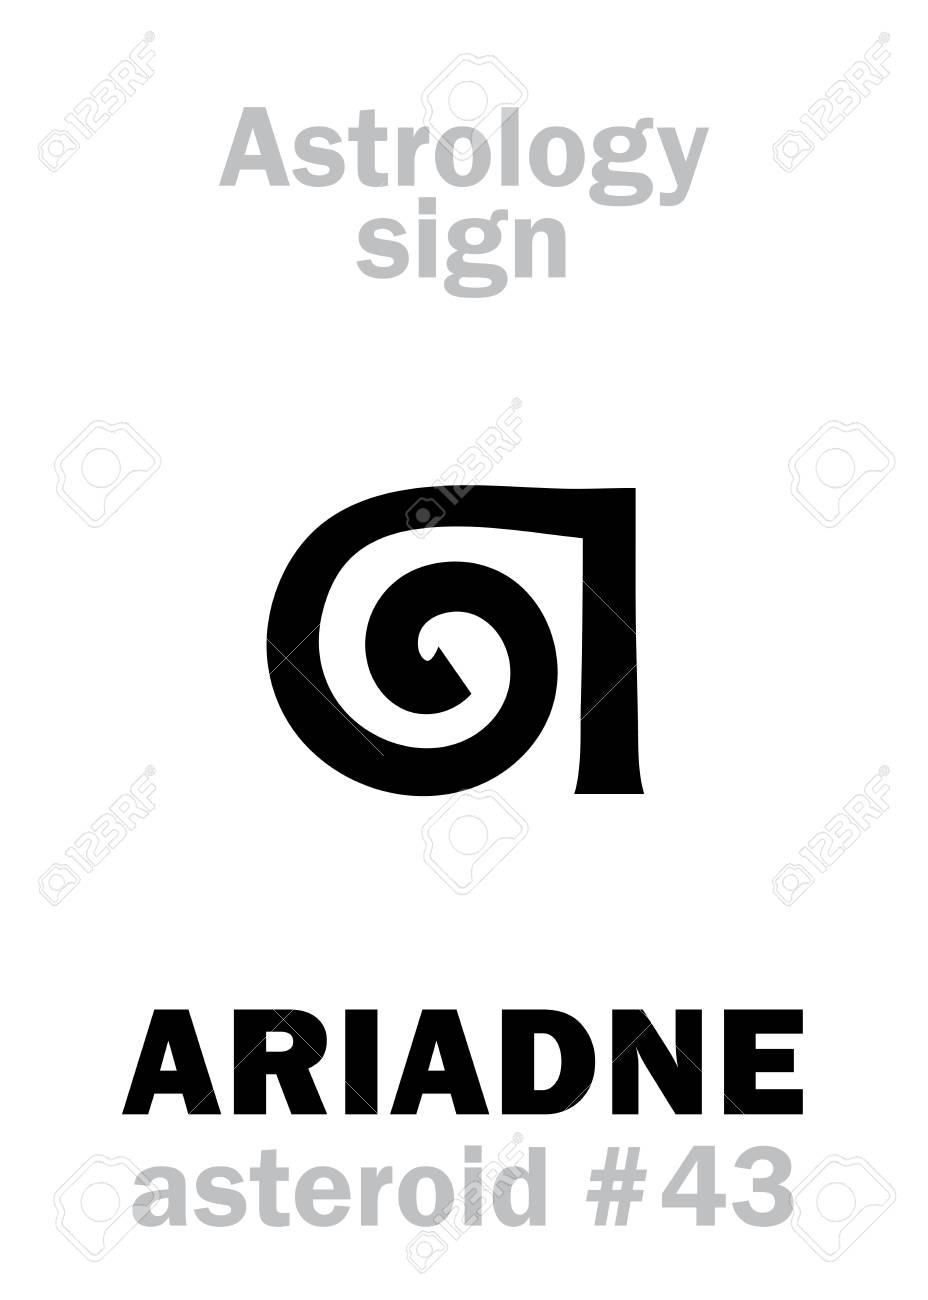 Astrology Alphabet: ARIADNE, asteroid #43  Hieroglyphics character